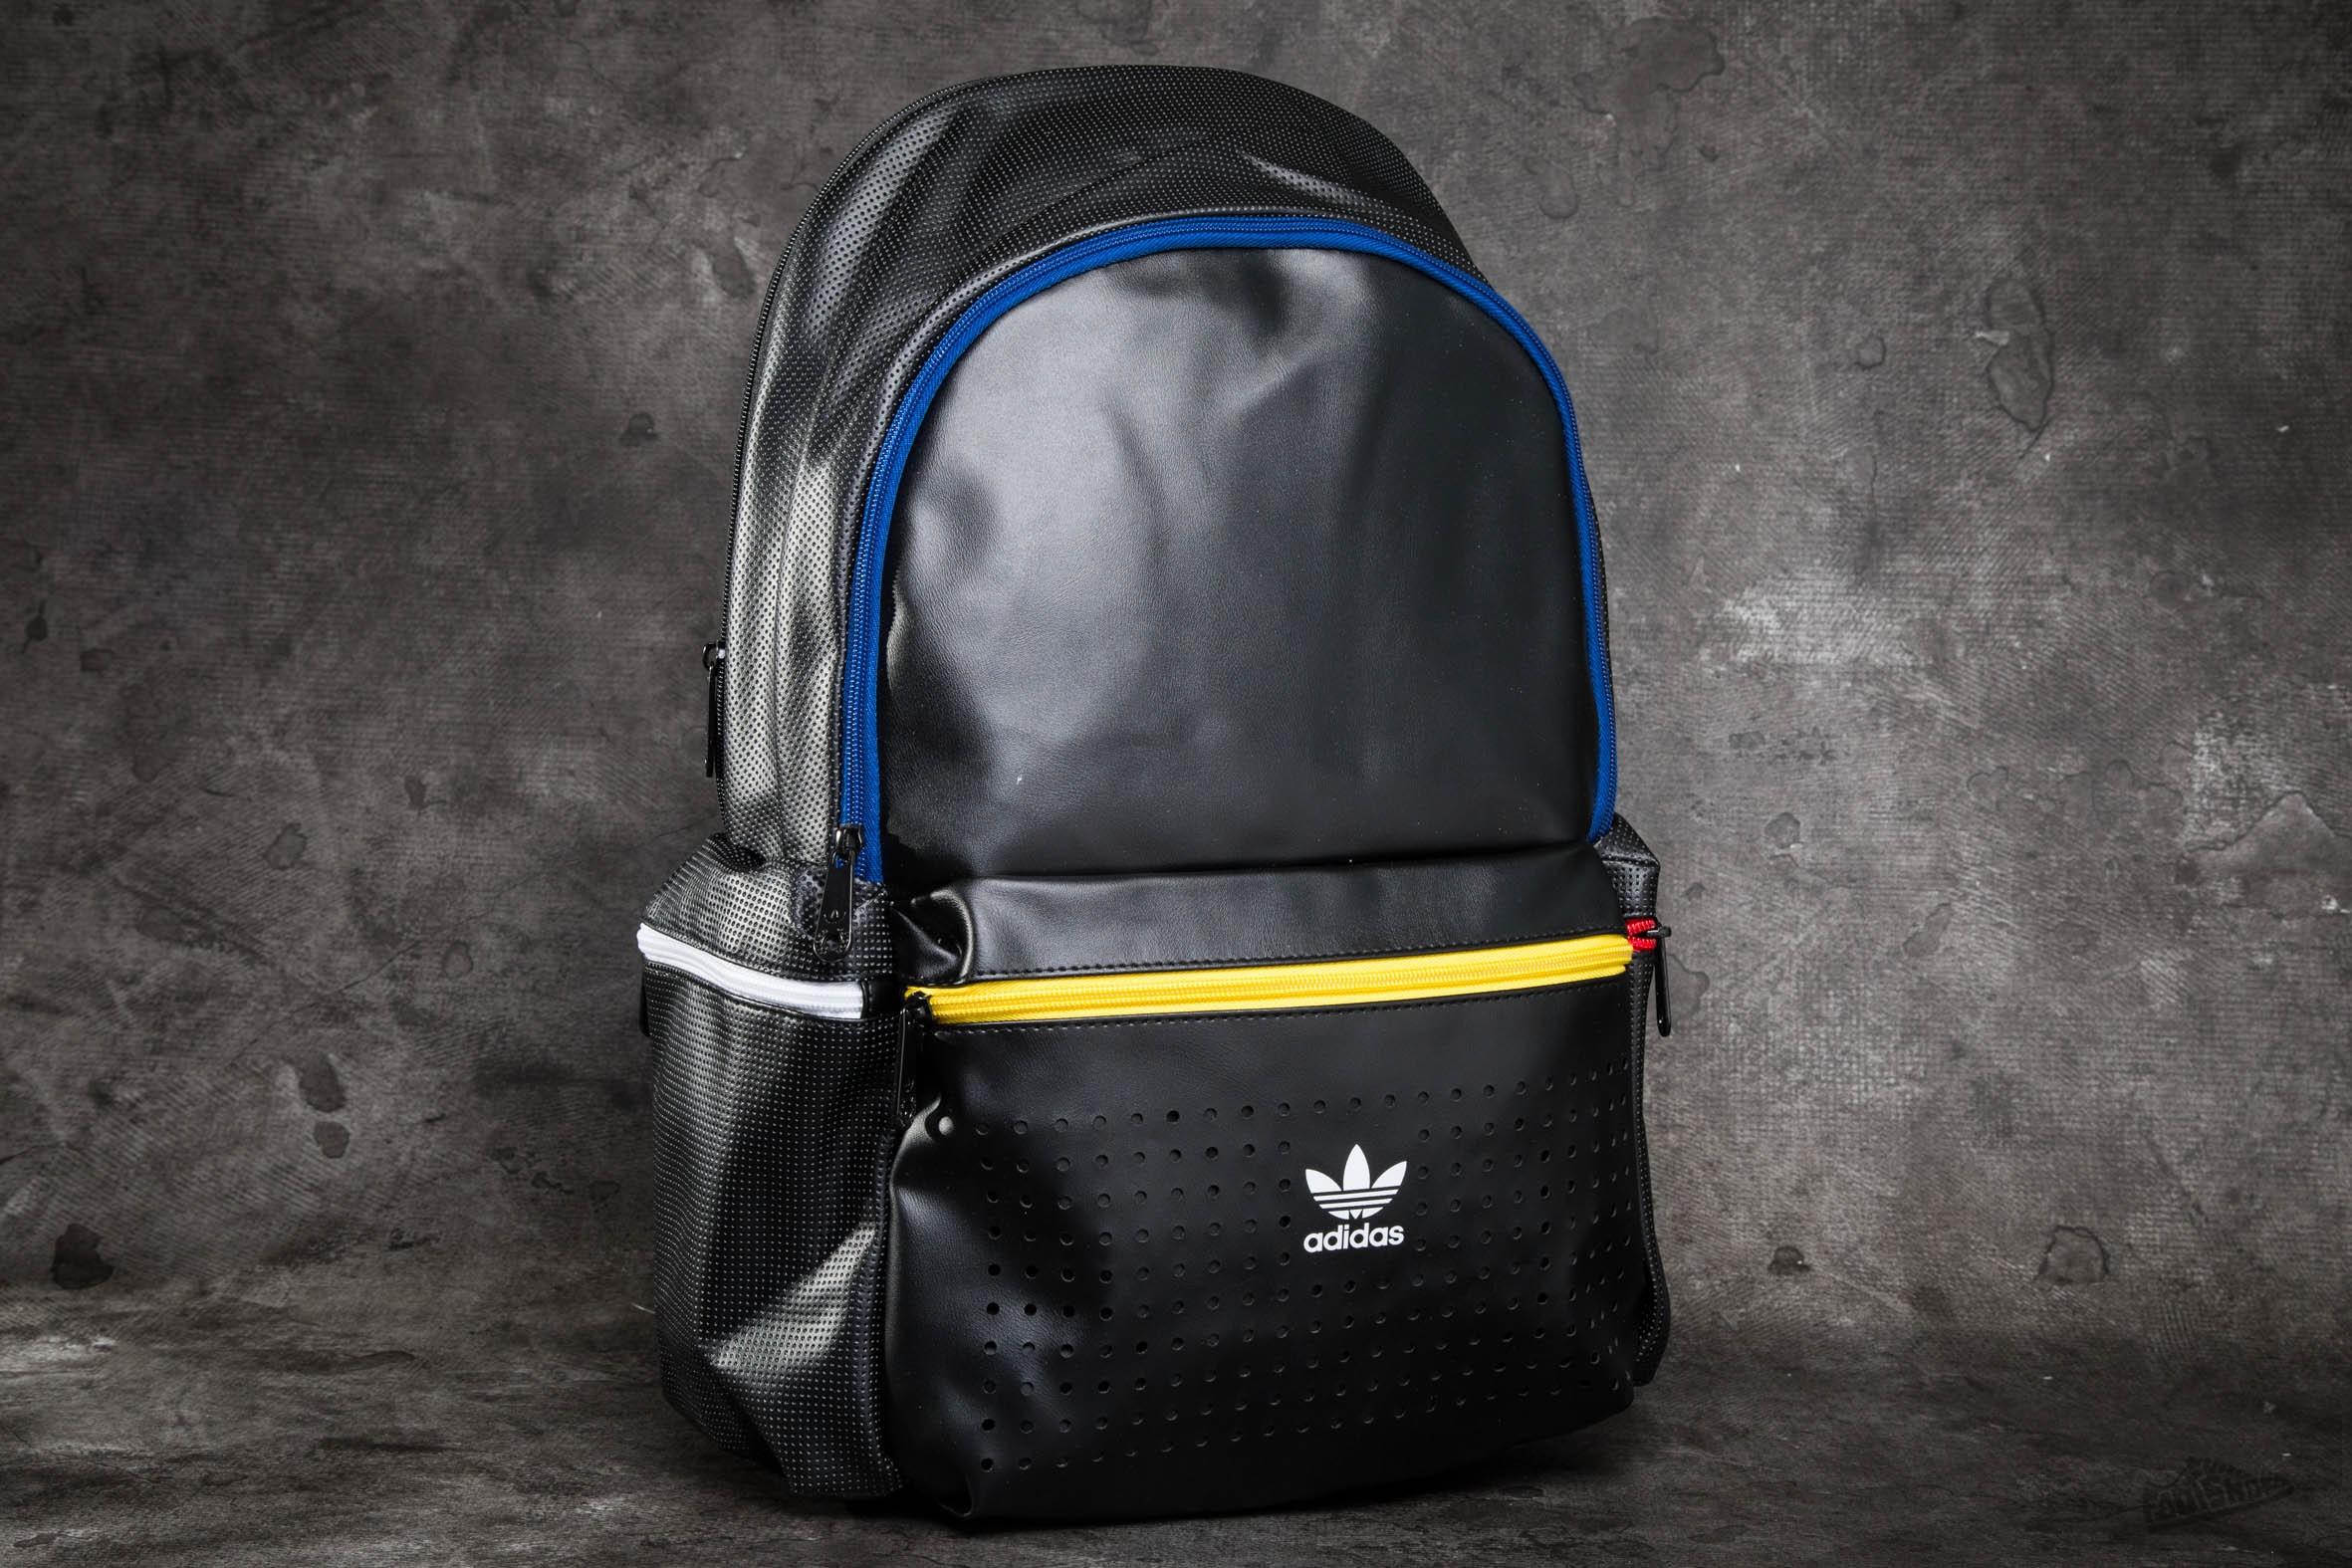 Pocket BlackFootshop Adidas BlackFootshop Adidas Backpack Pocket Pocket 3 3 3 Adidas Backpack iuOPkXZT